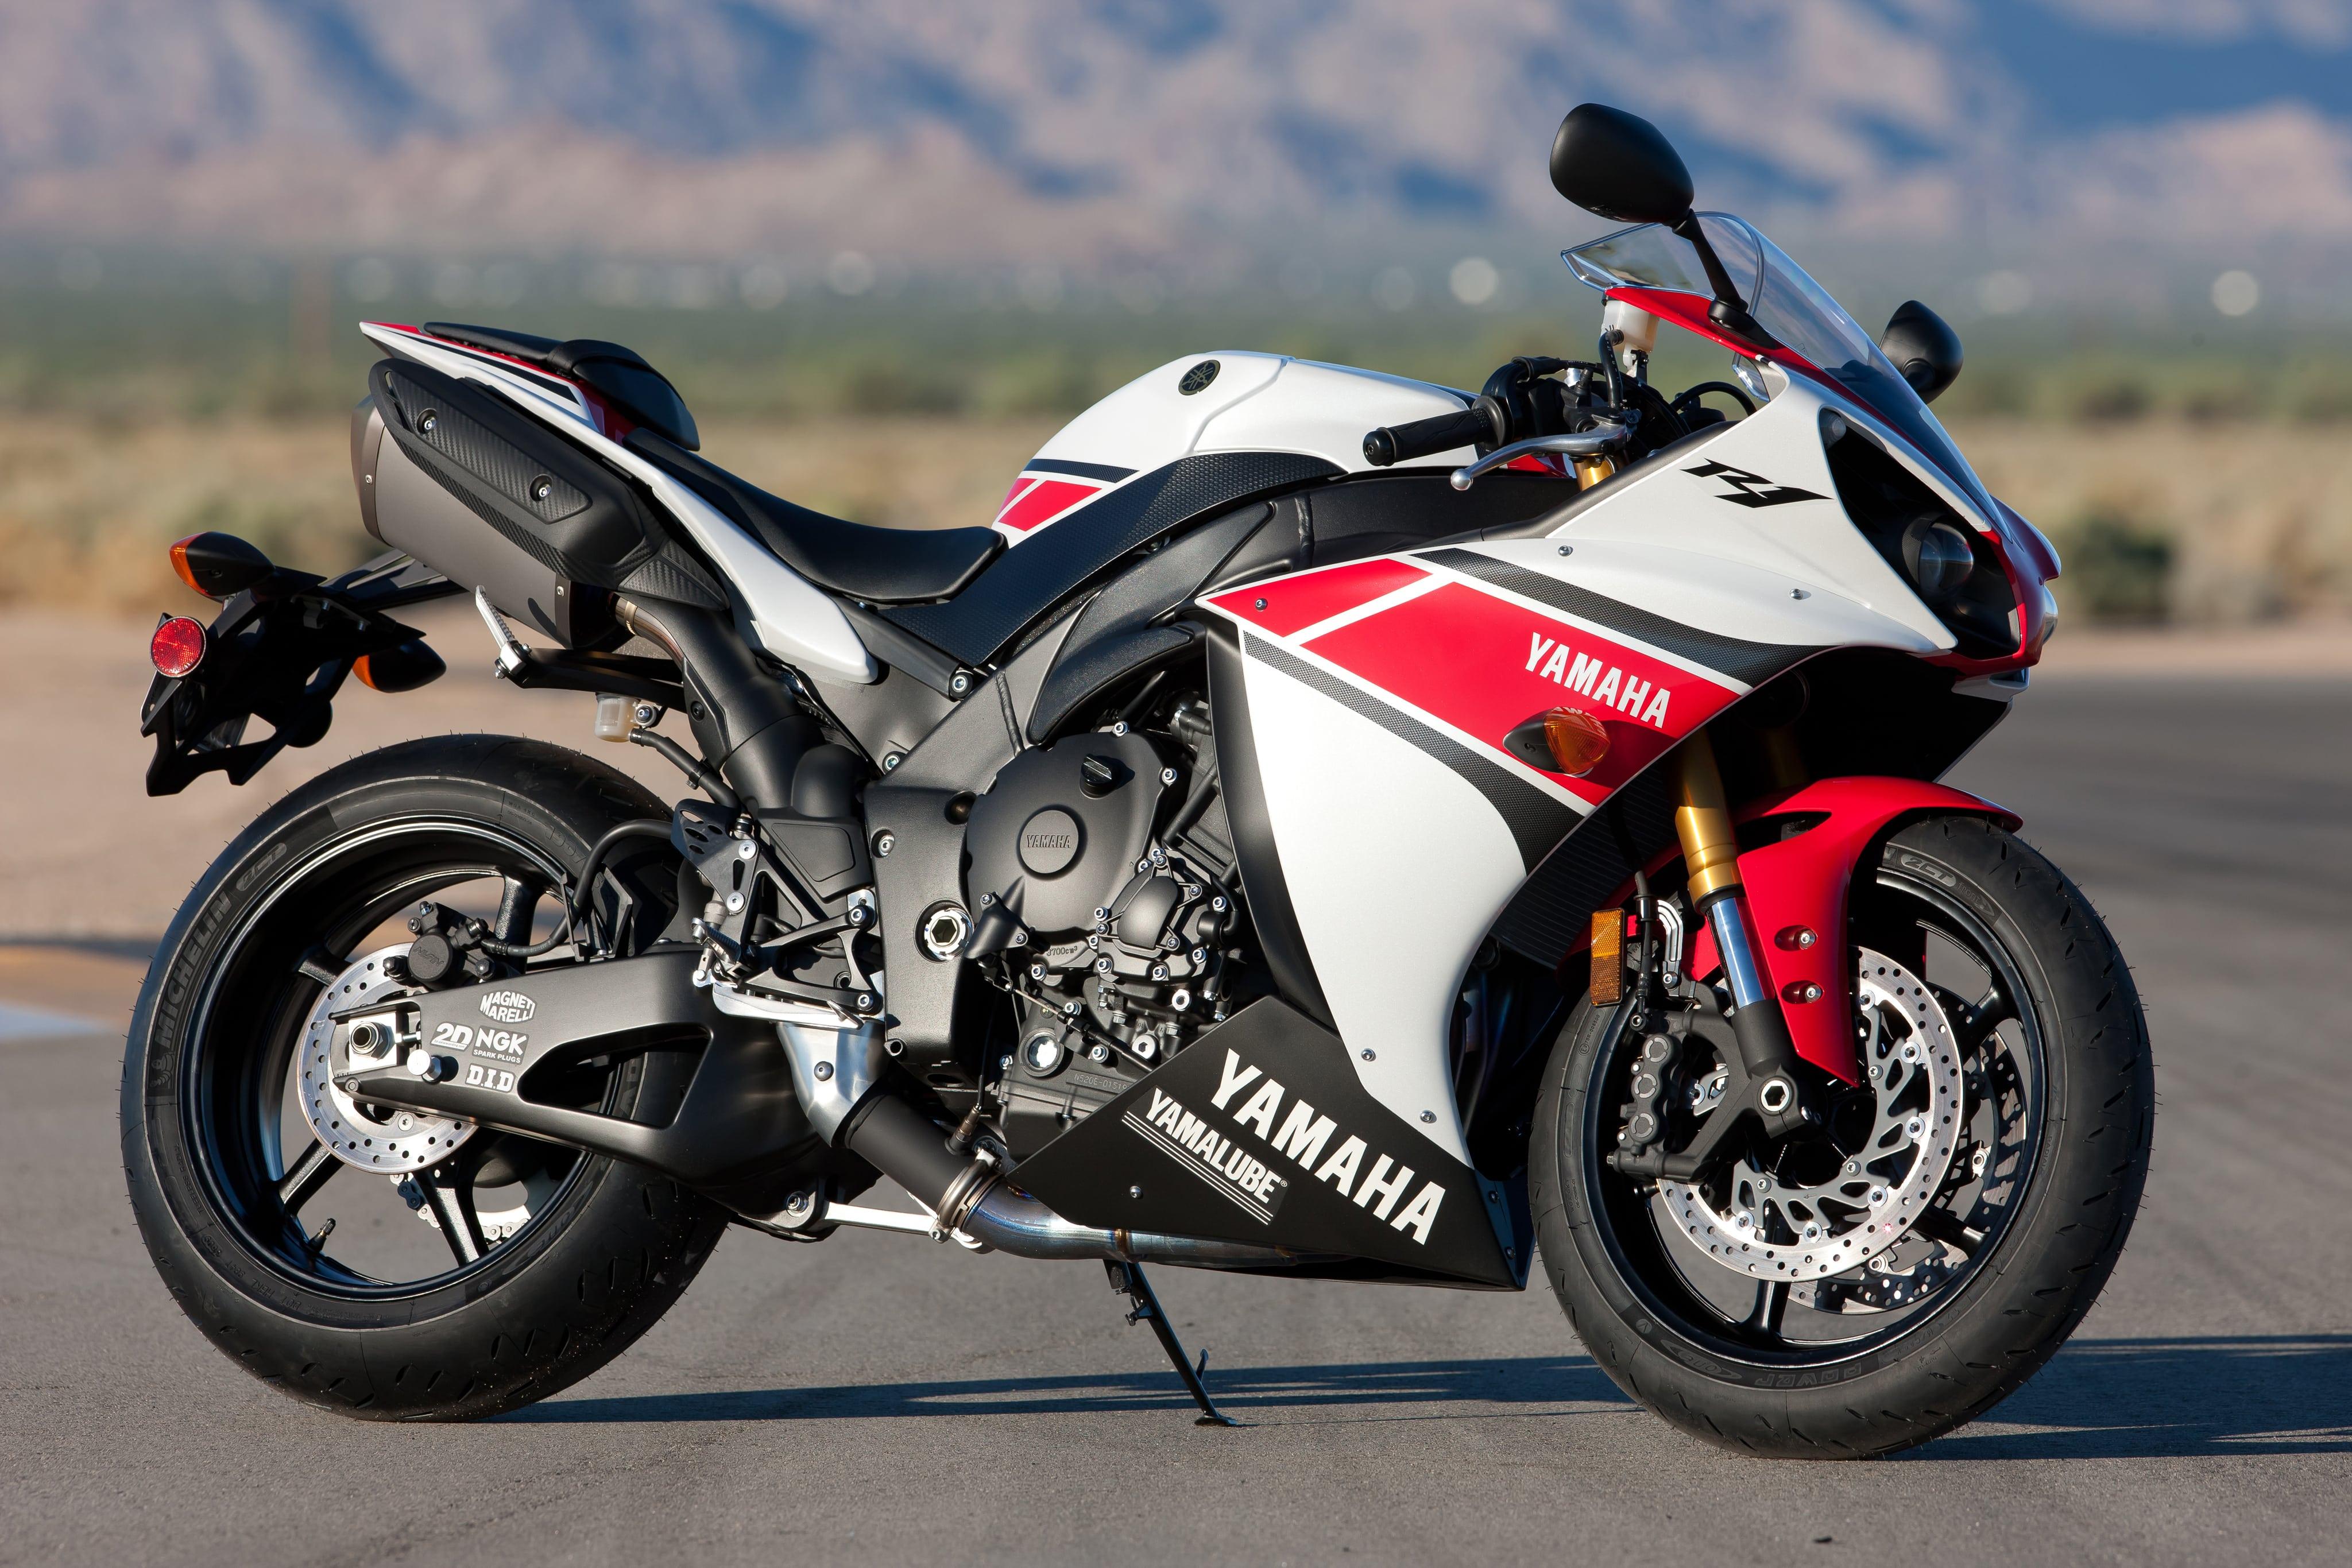 Yamaha YZF-R1 2012 Screensavers